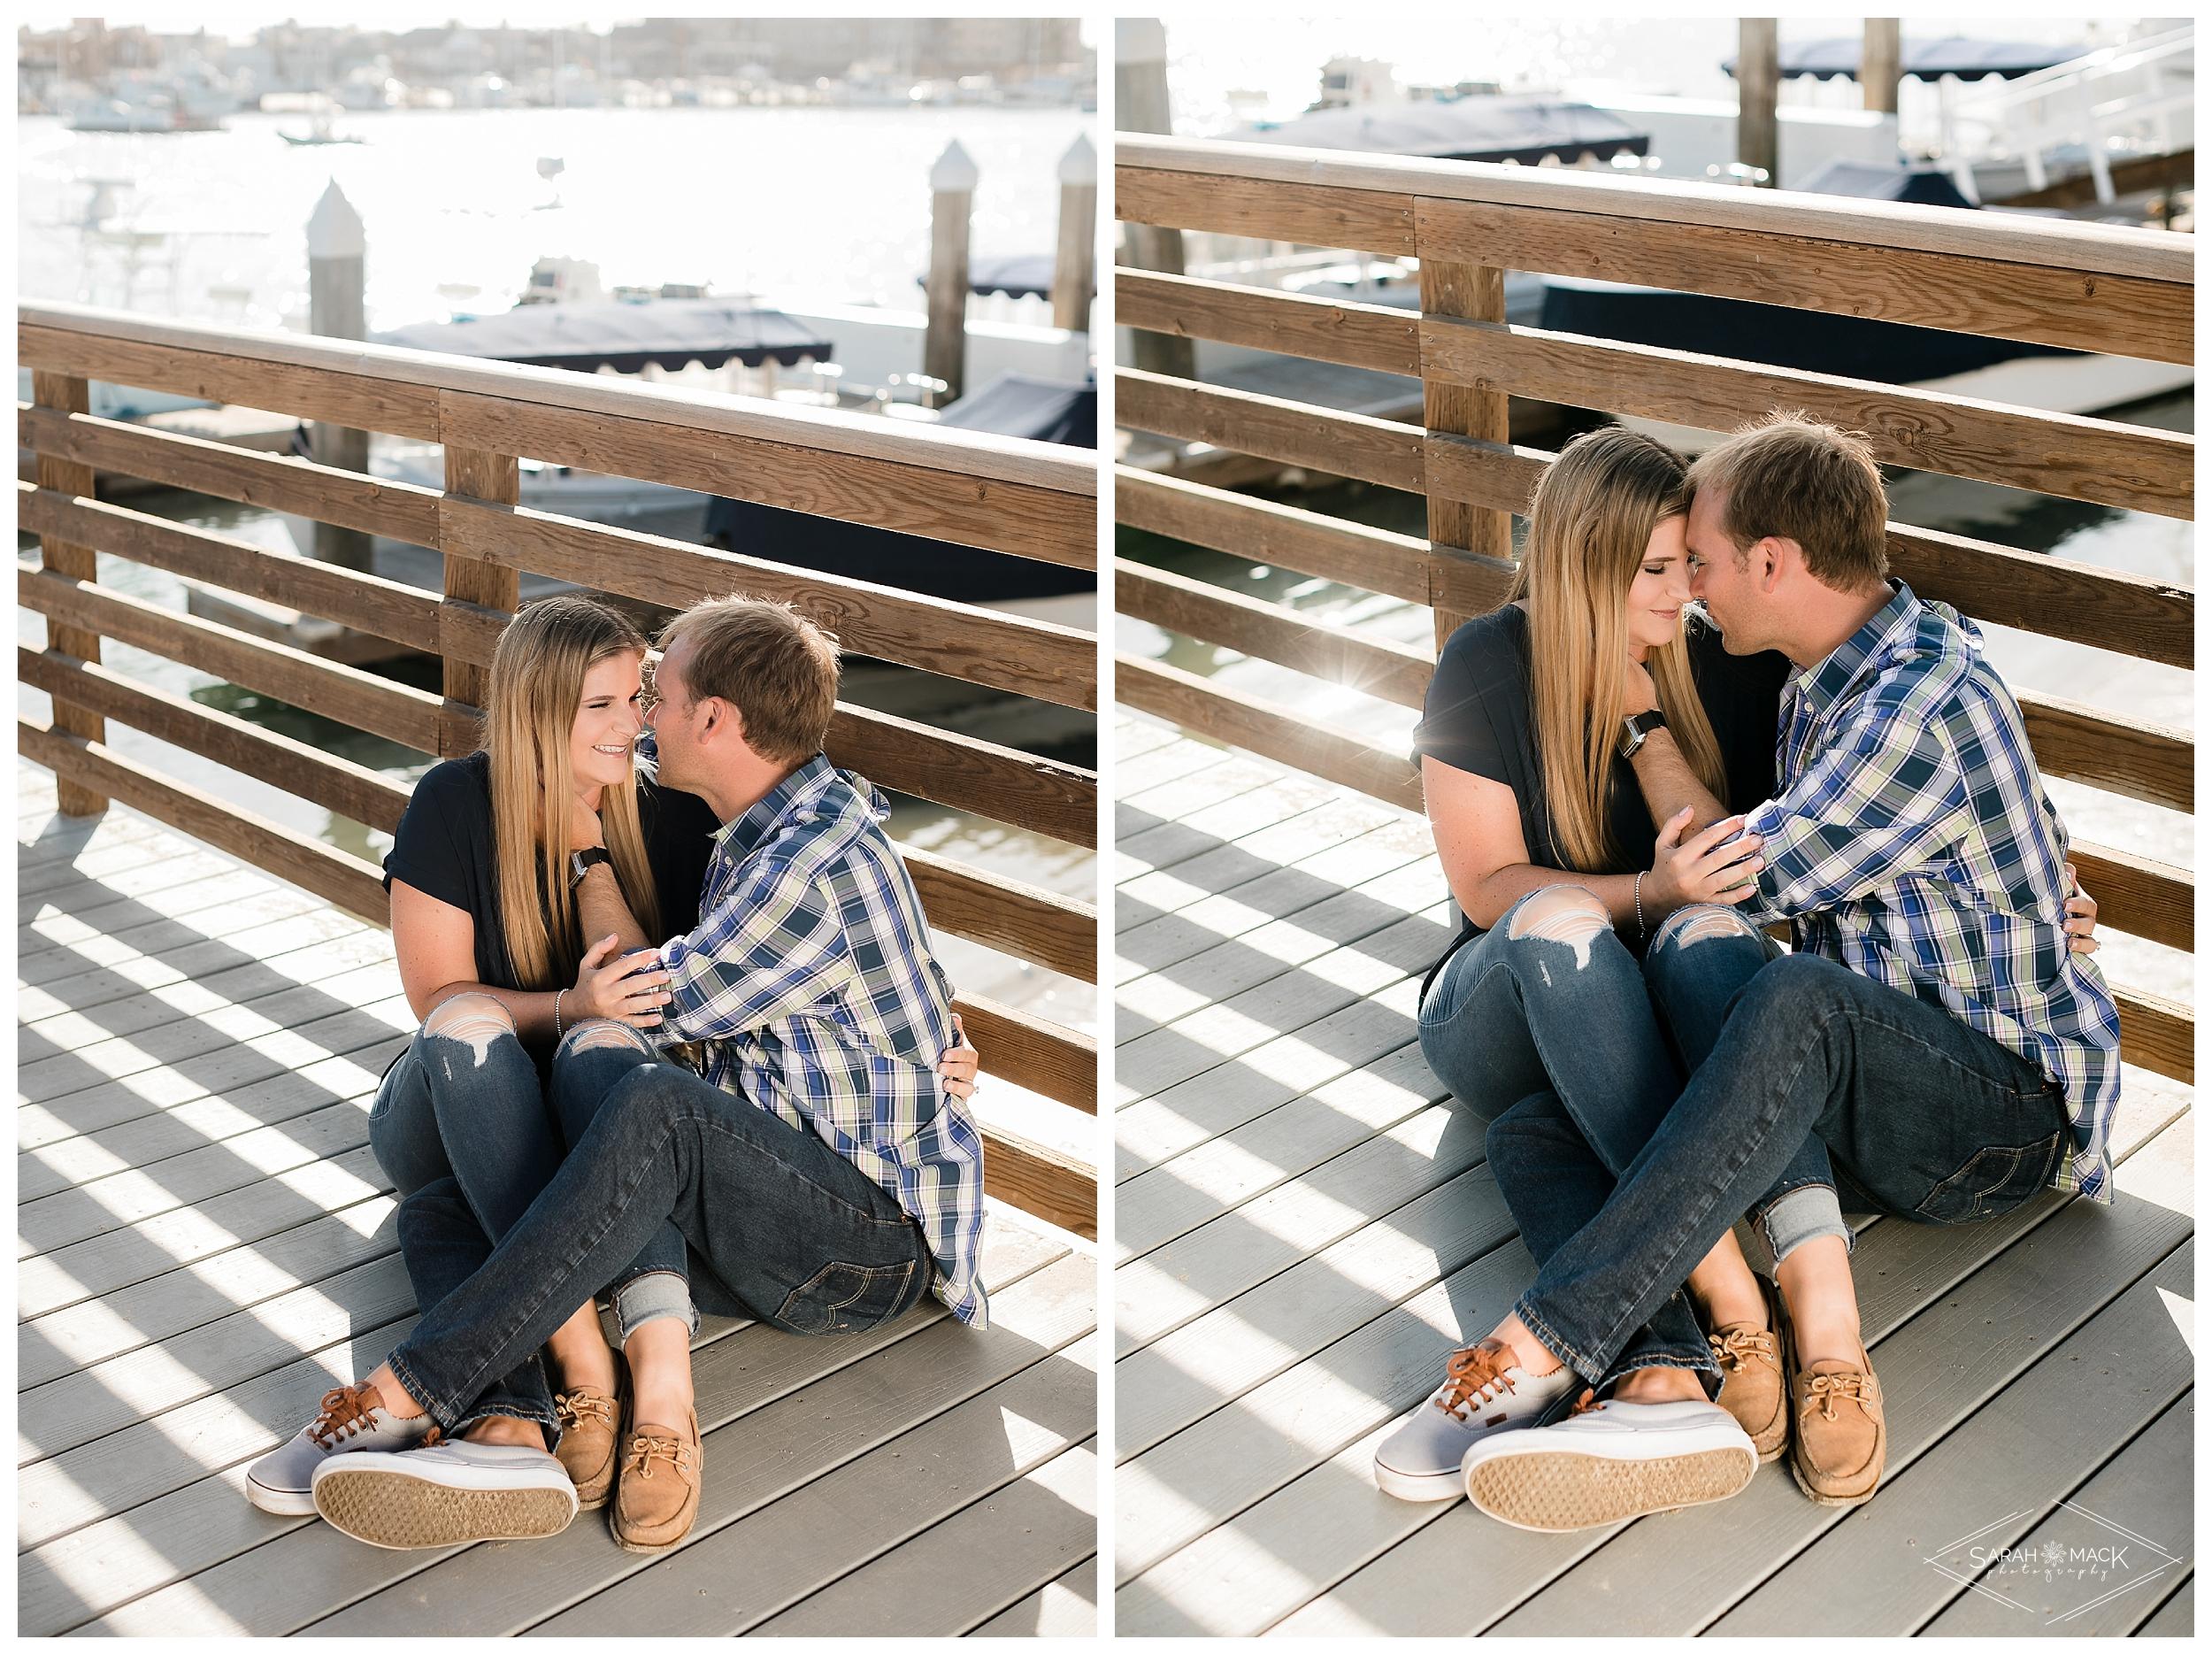 HI_Balboa_Island_Newport-Beach-Engagement-Photography-009.jpg